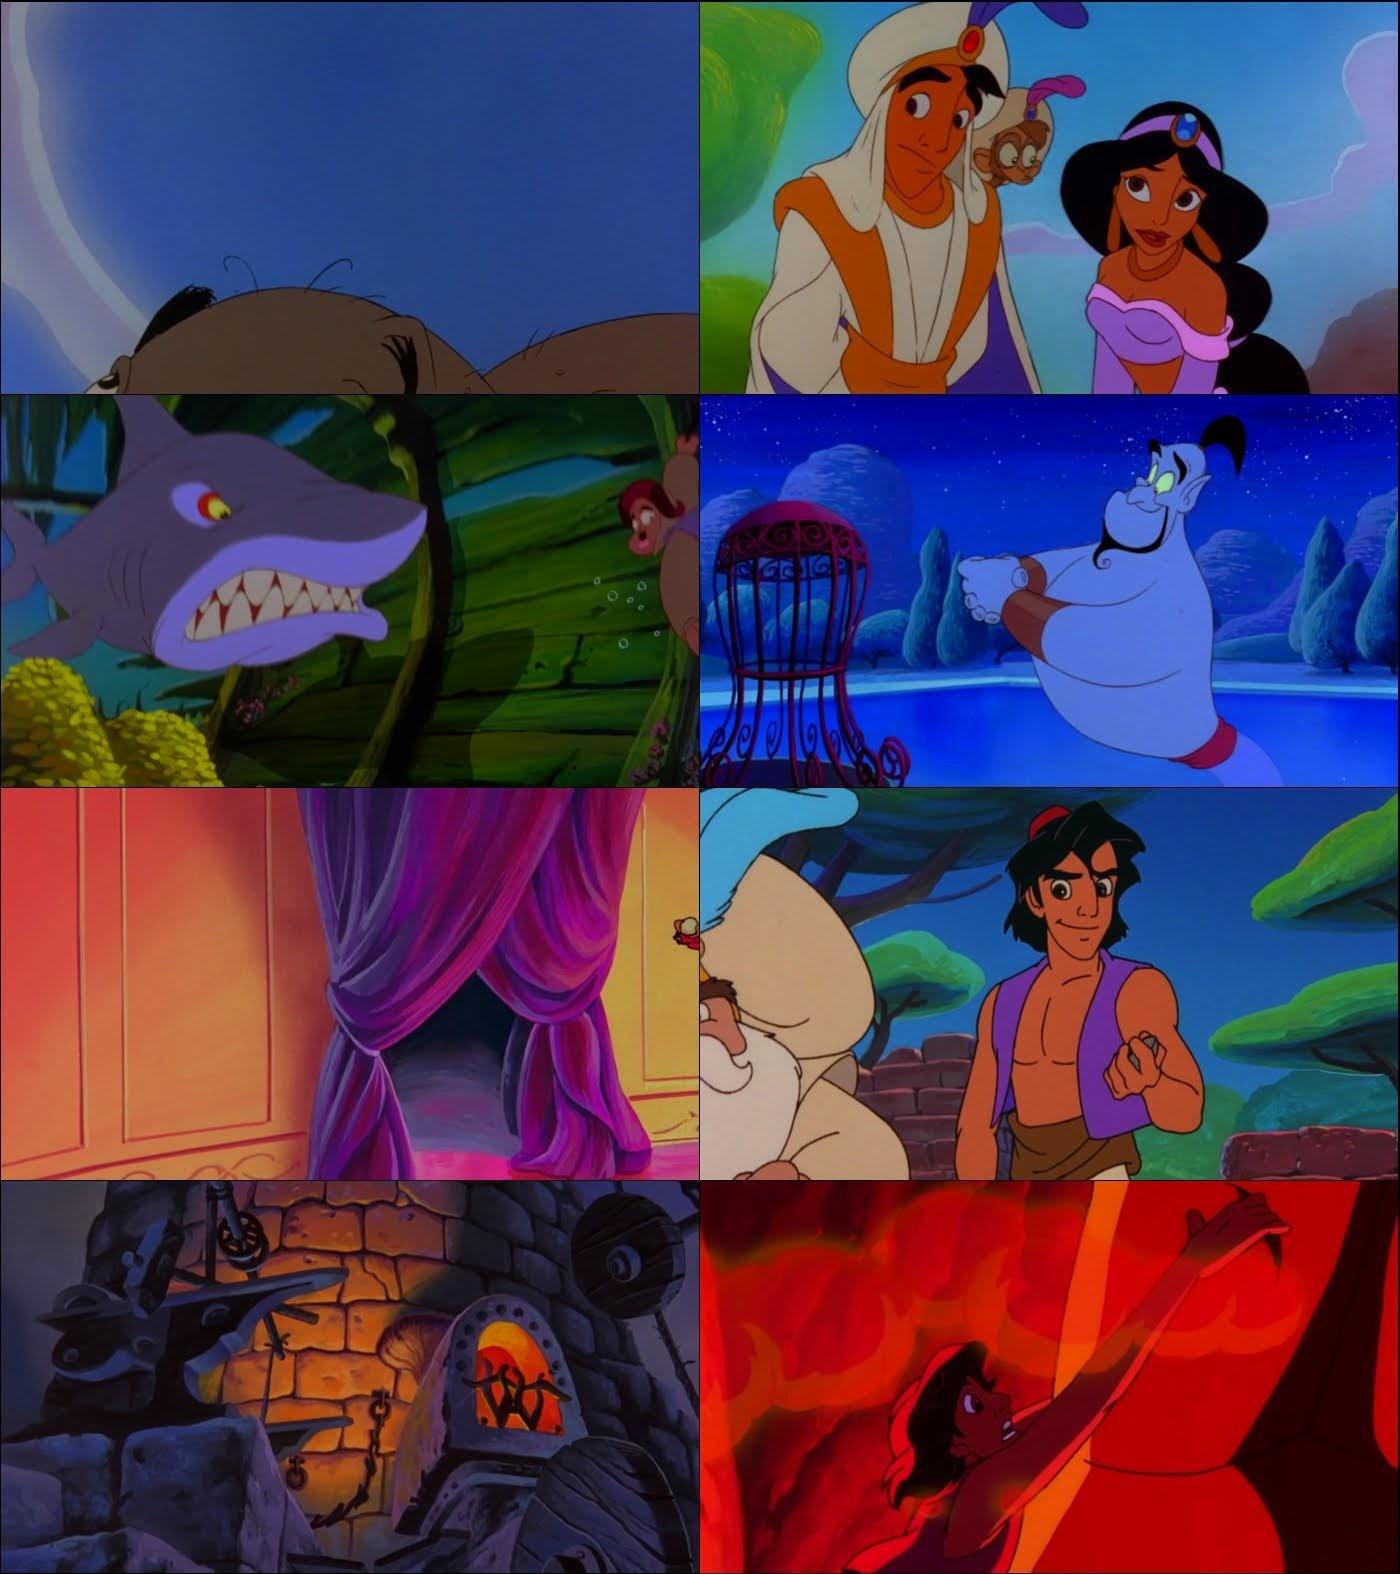 Aladdin 2 [1080p] [Latino-Ingles] [MEGA] - MegaPeliculasRip